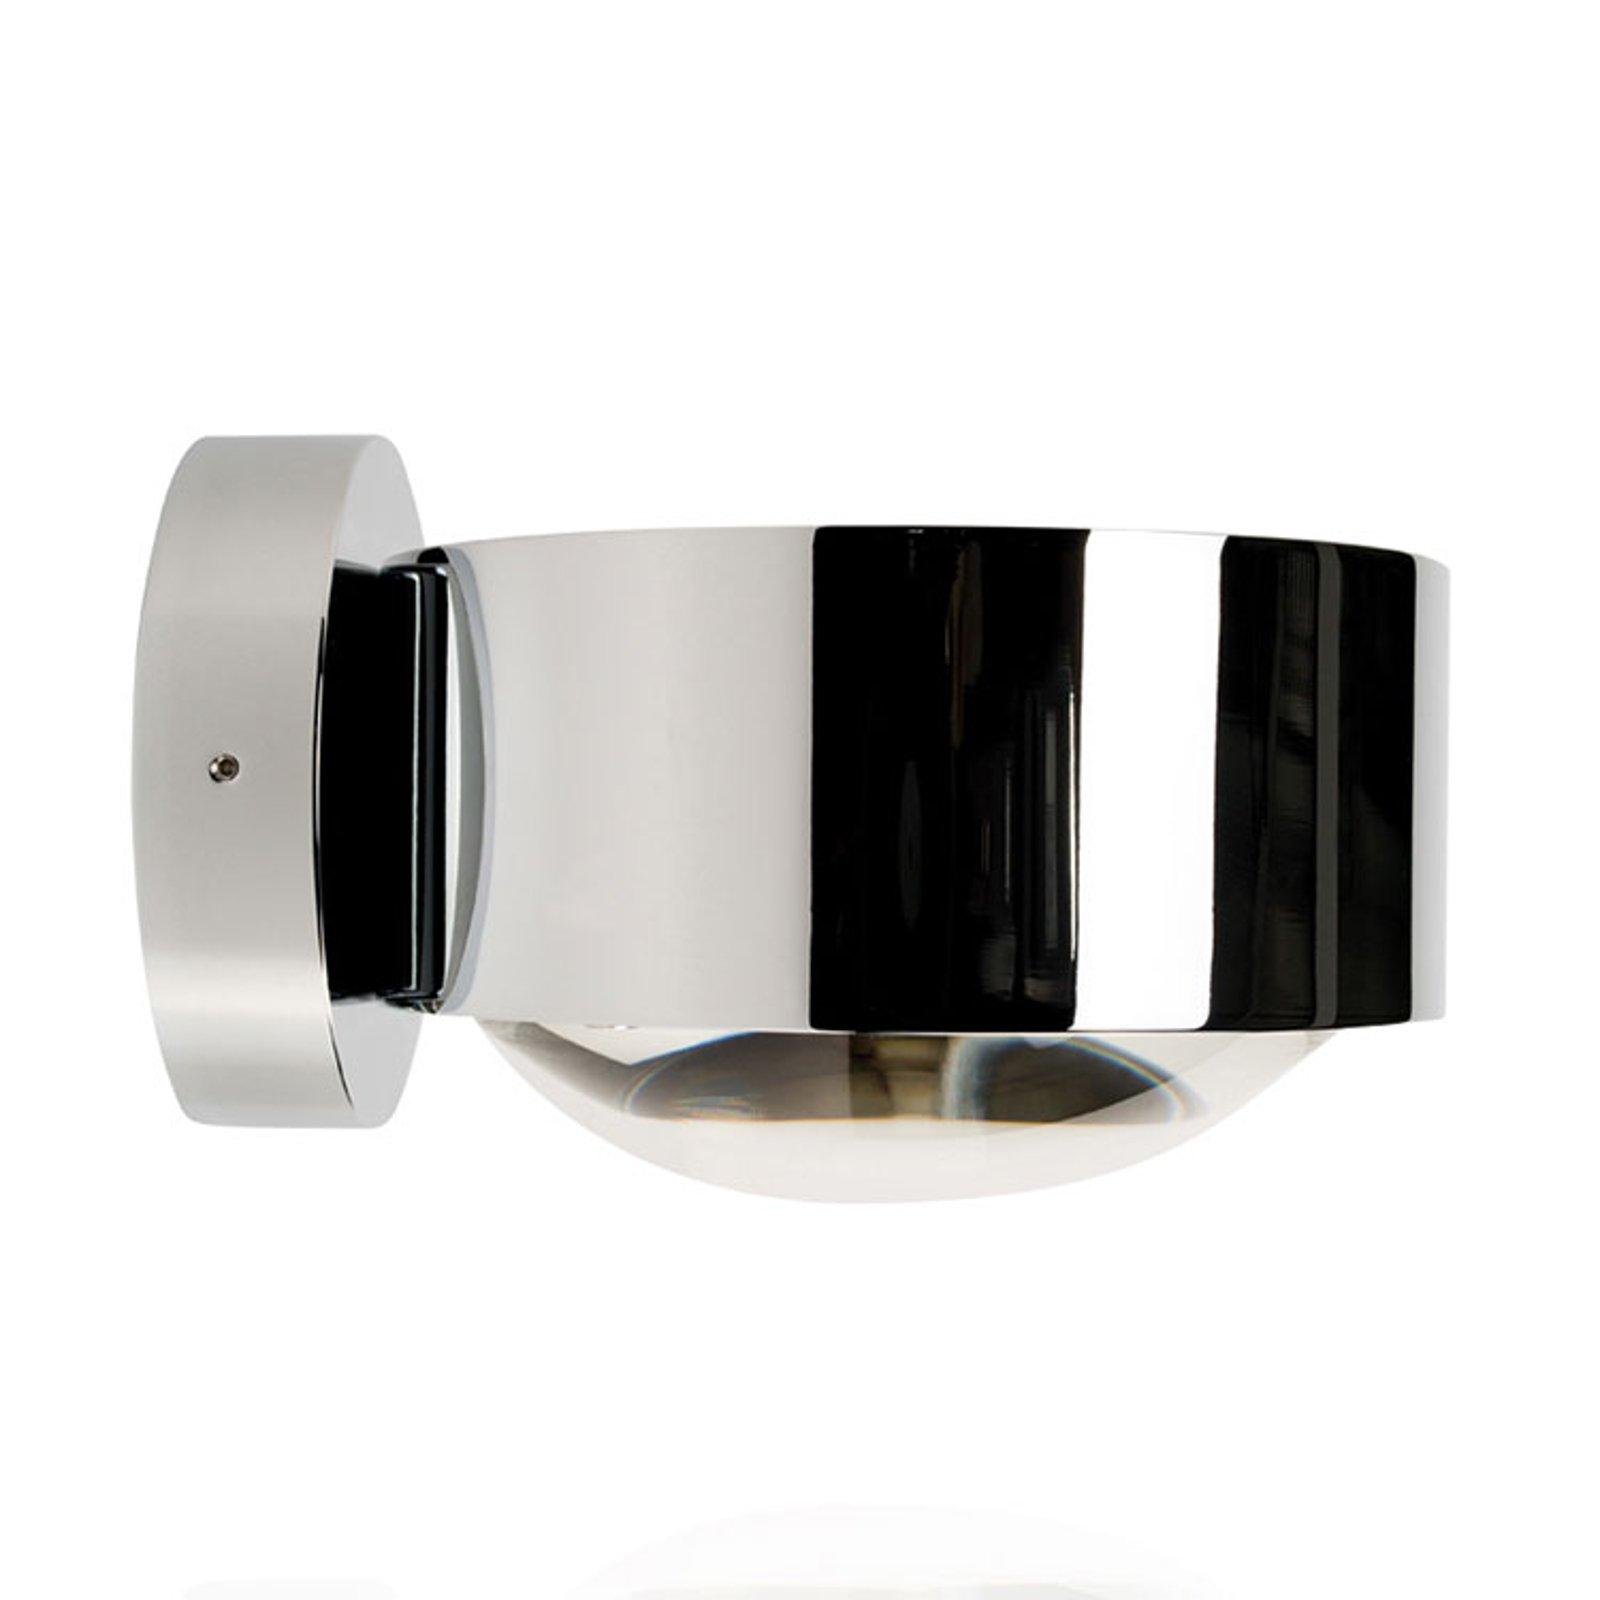 LED-vegglampe Puk Maxx Wall, krom